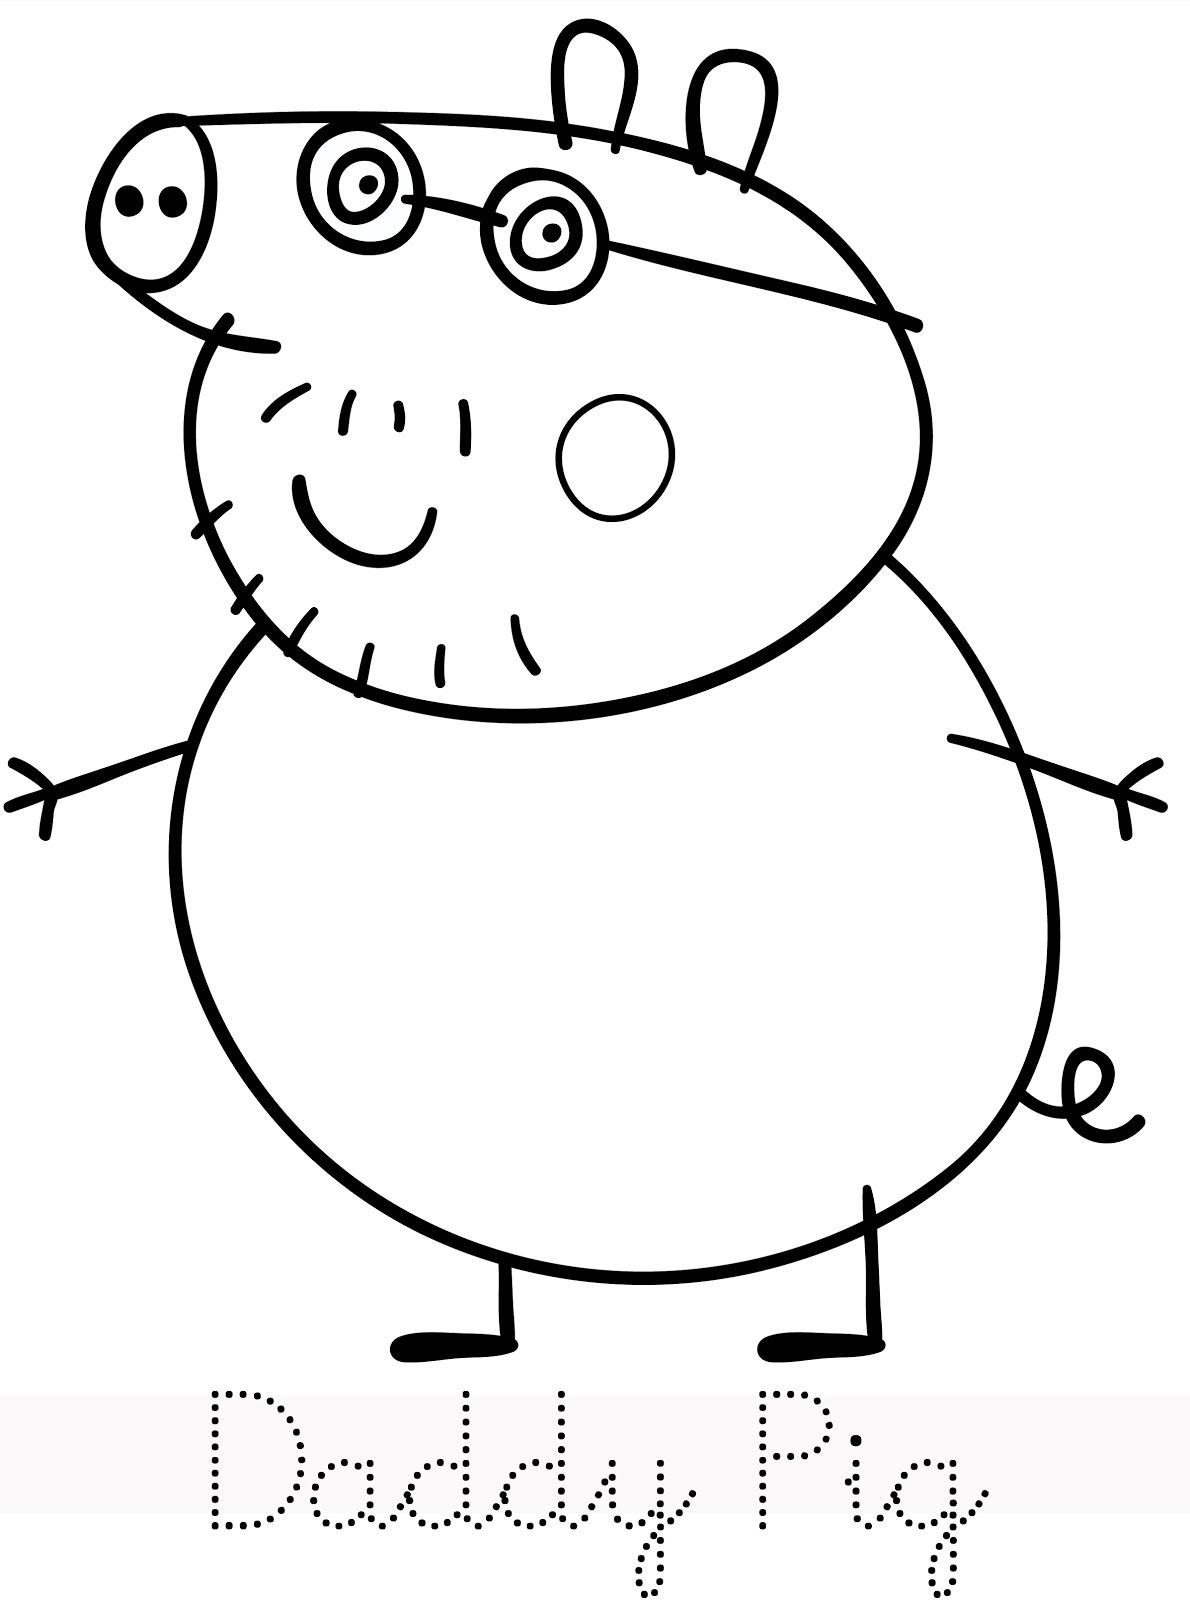 111 dibujos de peppa pig para colorear oh kids page 1 - Dibujos de pared ...